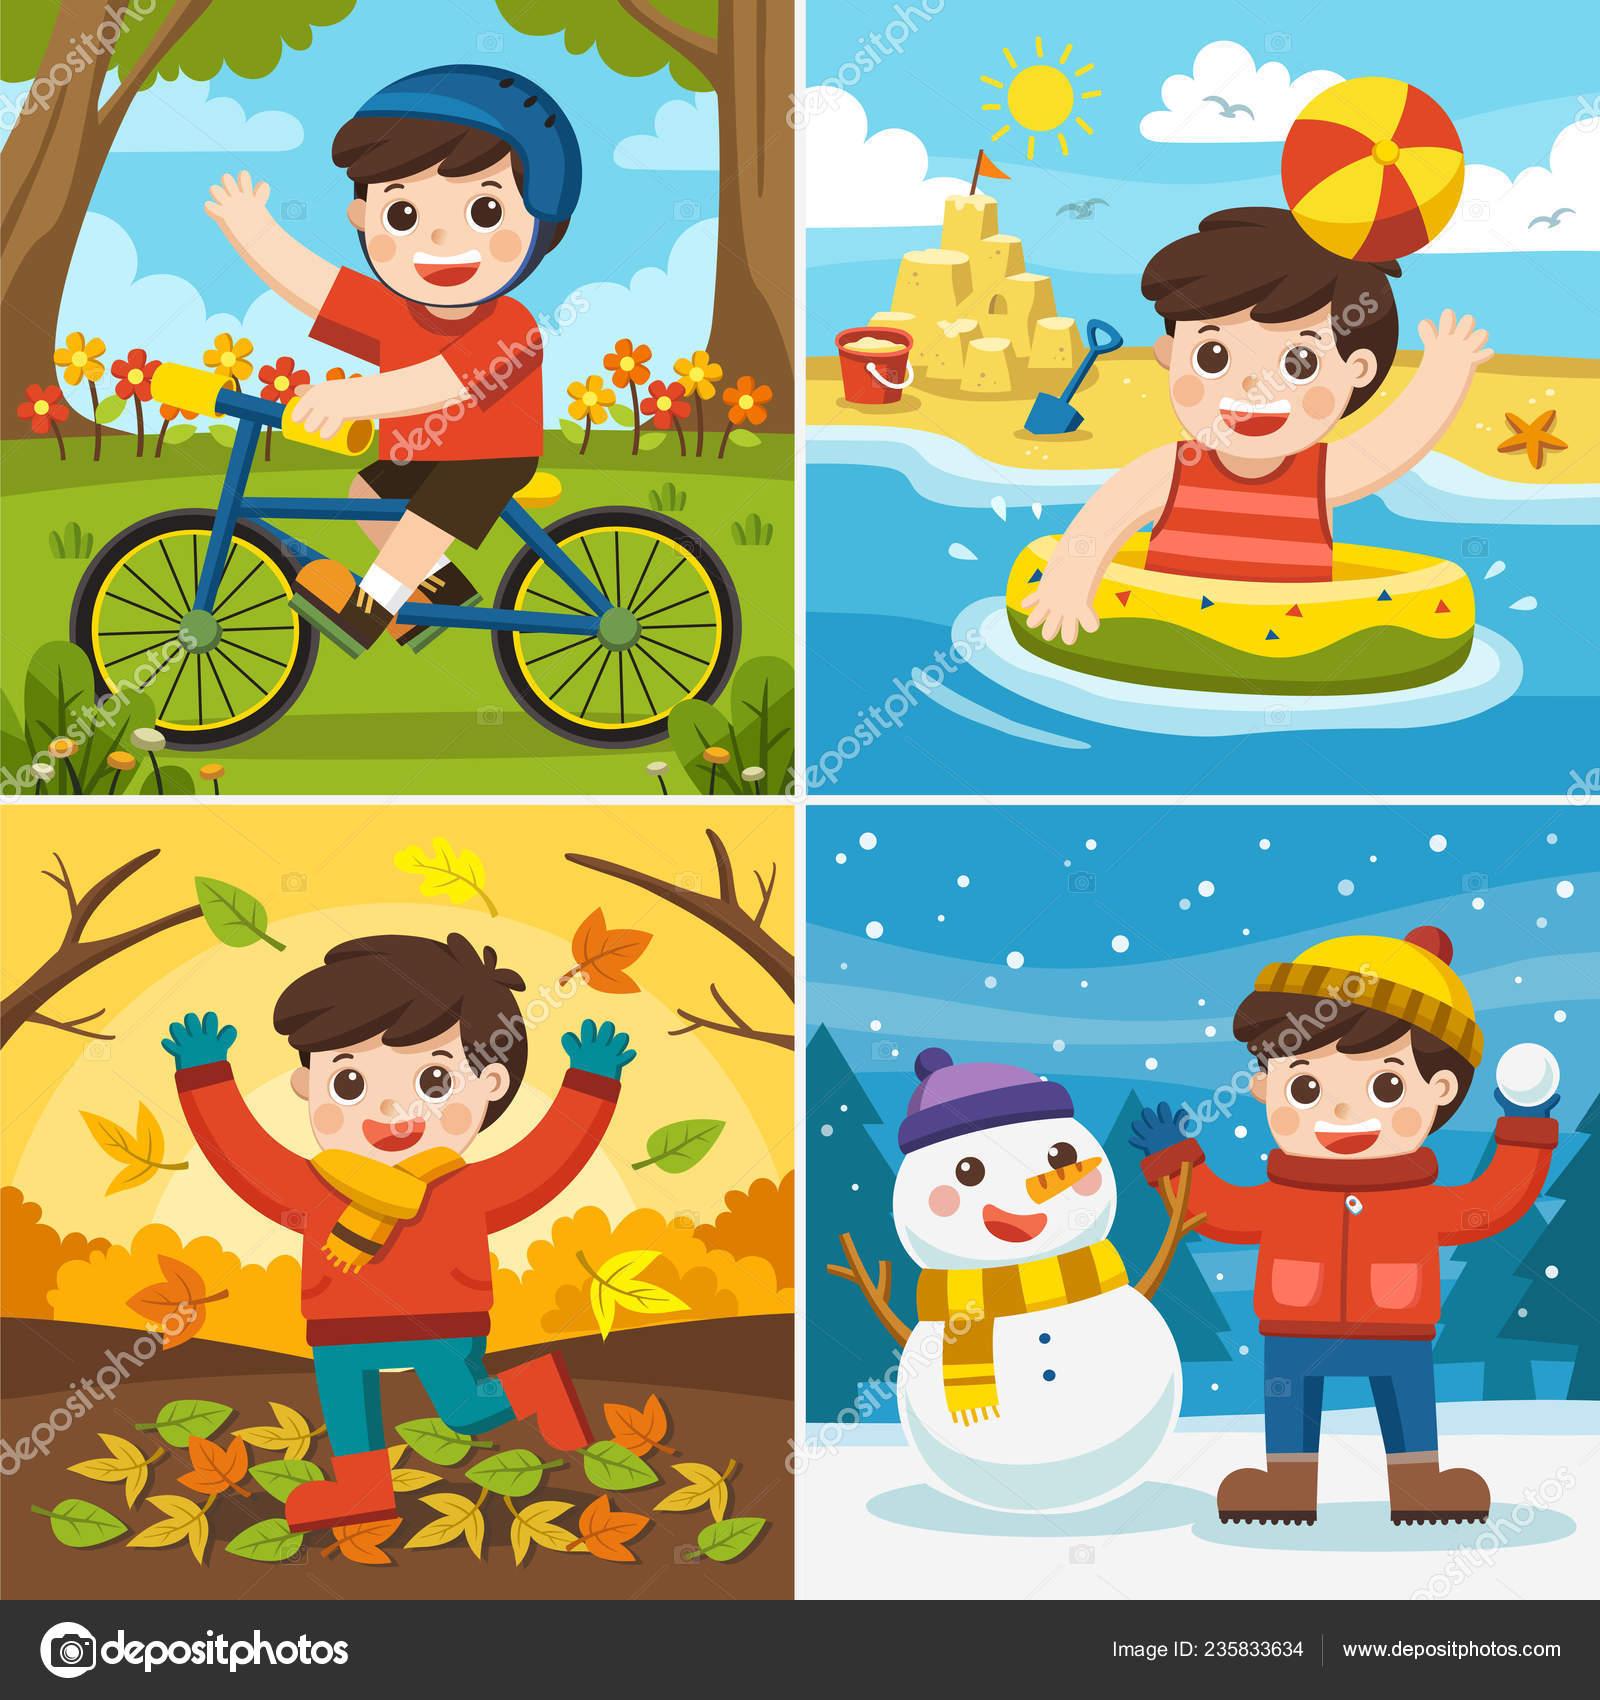 Illustration Four Seasons Weather Cute Boy Playing